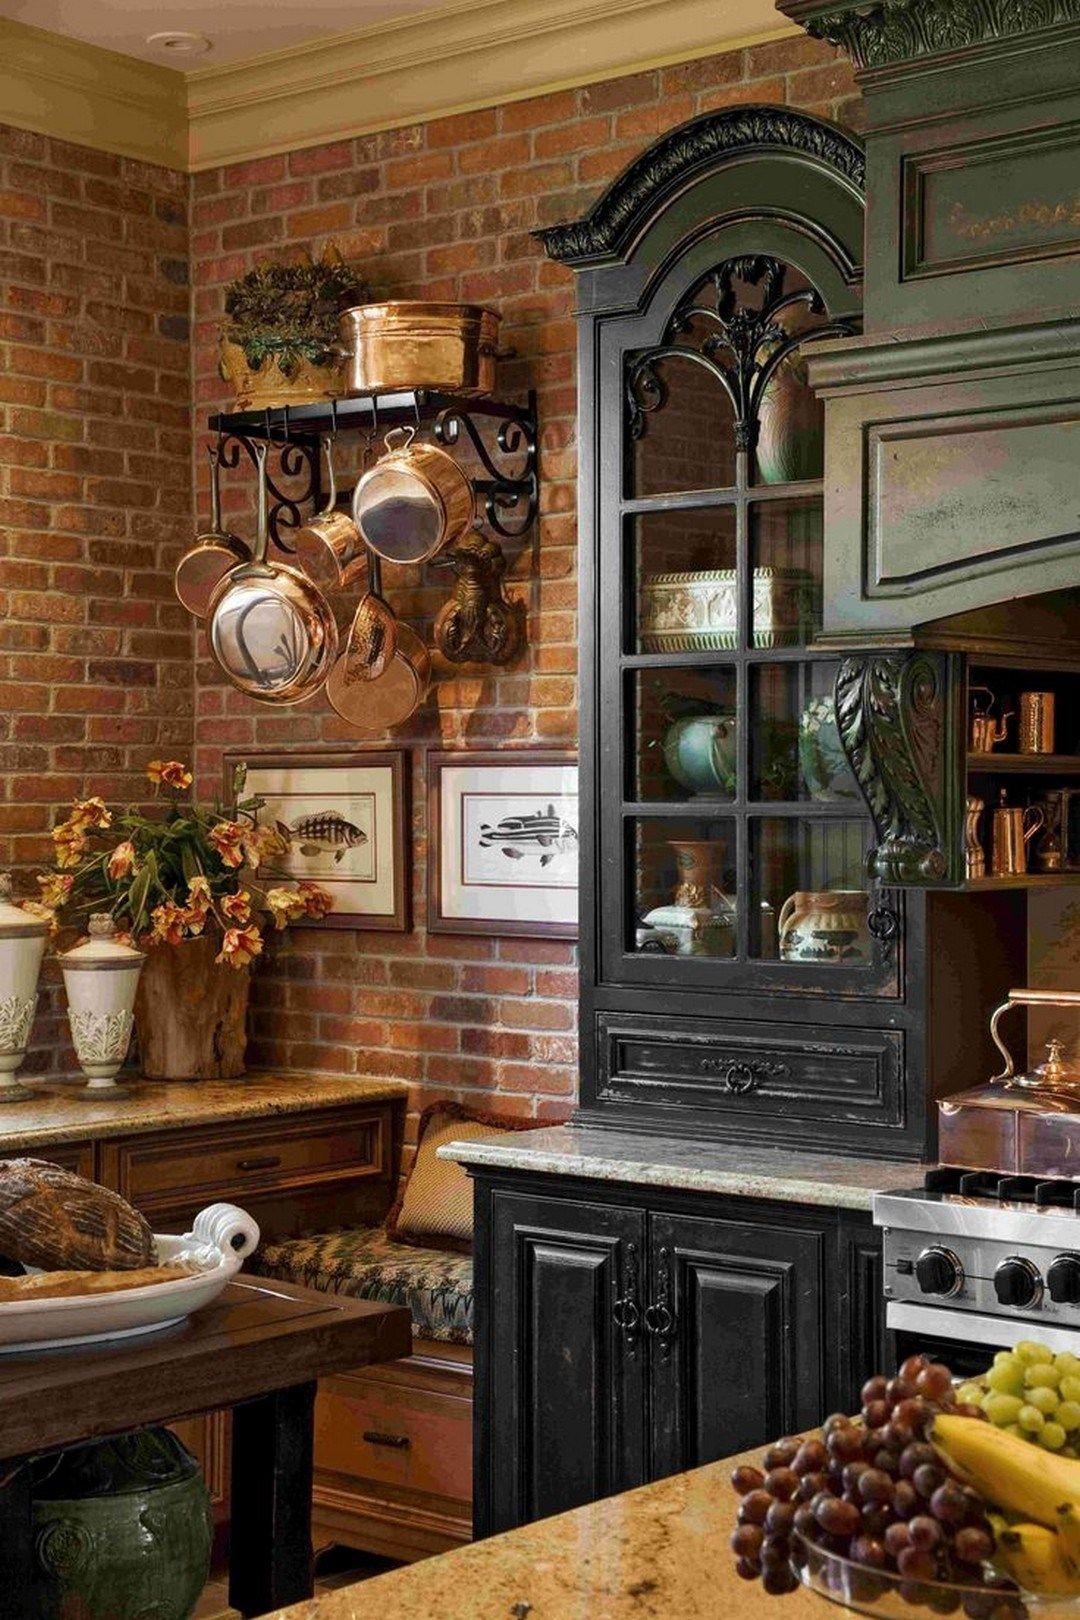 99 French Country Kitchen Modern Design Ideas (47) | Kitchens ...